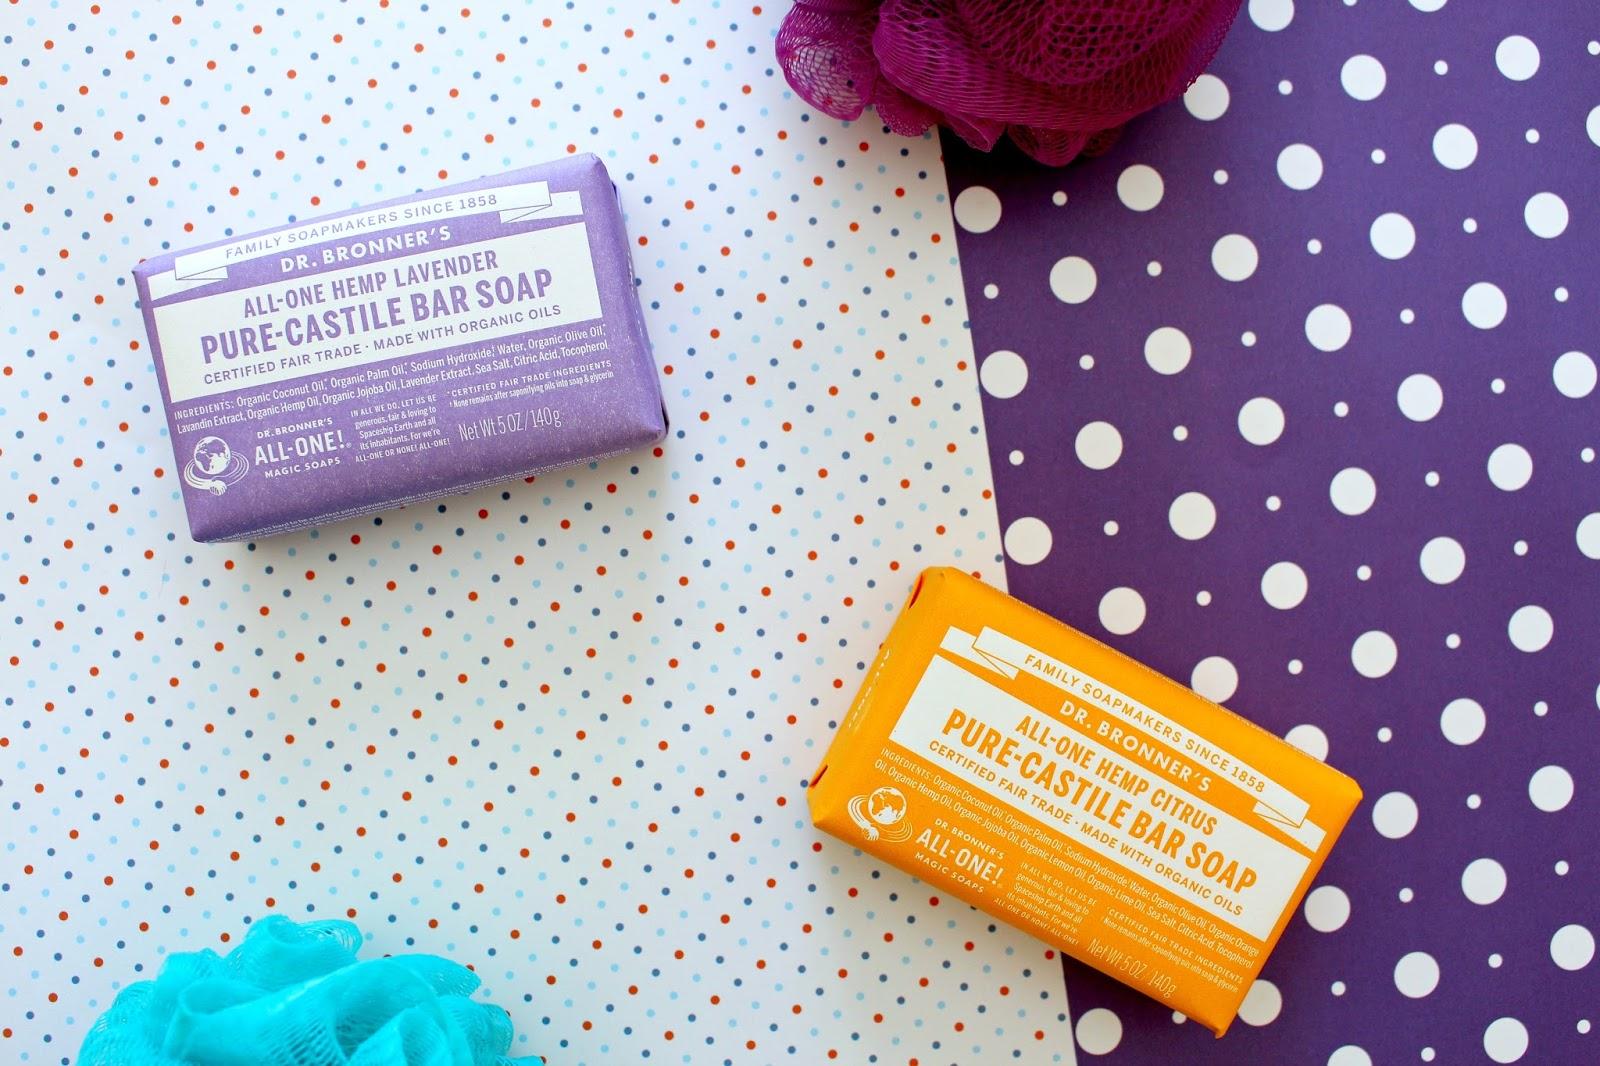 Dr. Bronner's Pure-Castile Bar Soap